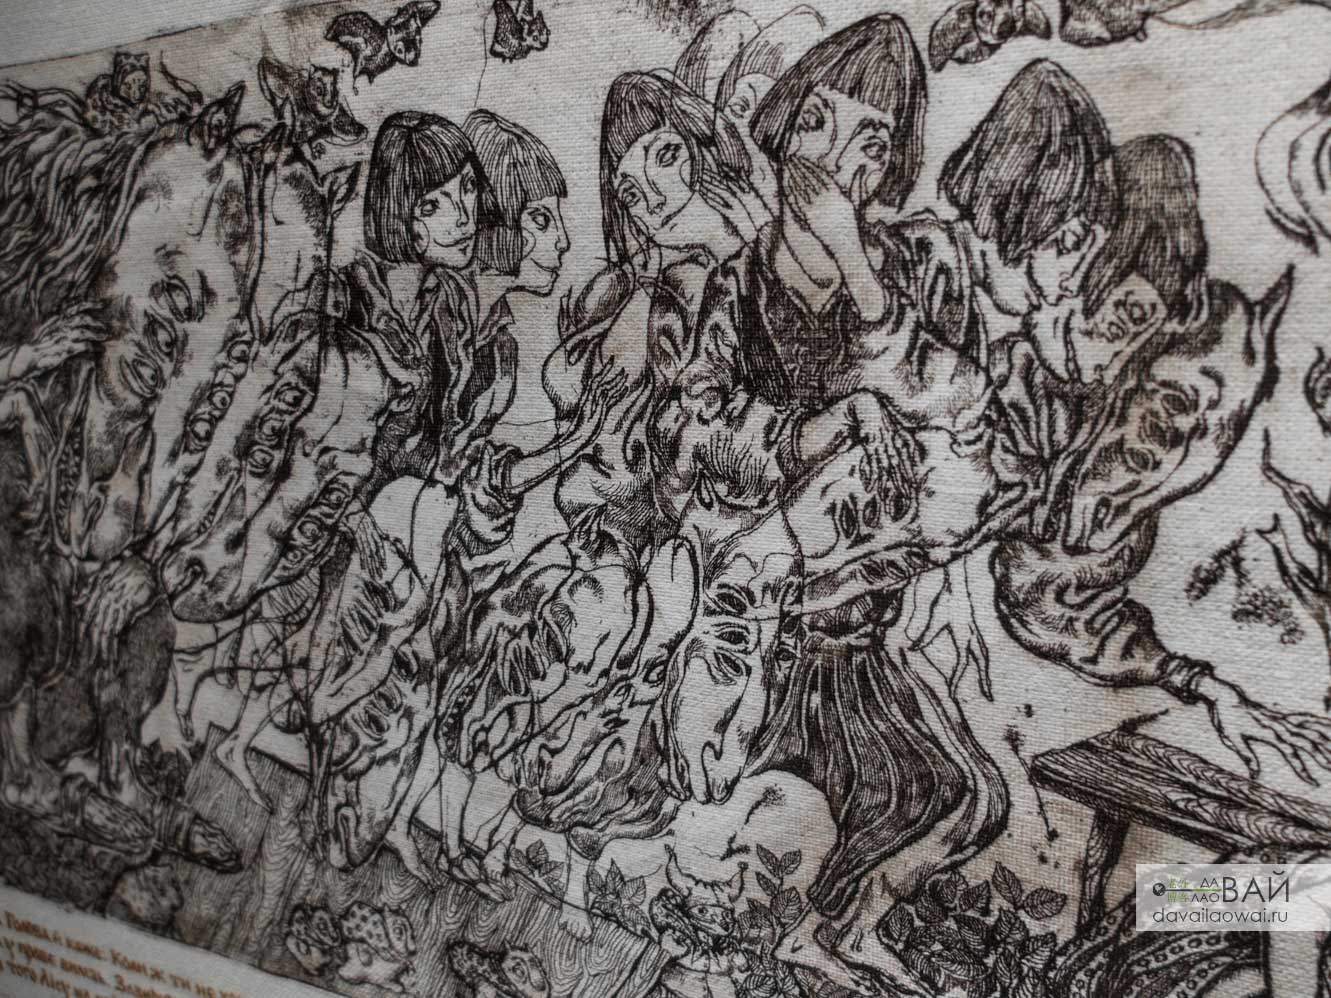 Юлия Тревитина иллюстрации сучжоу